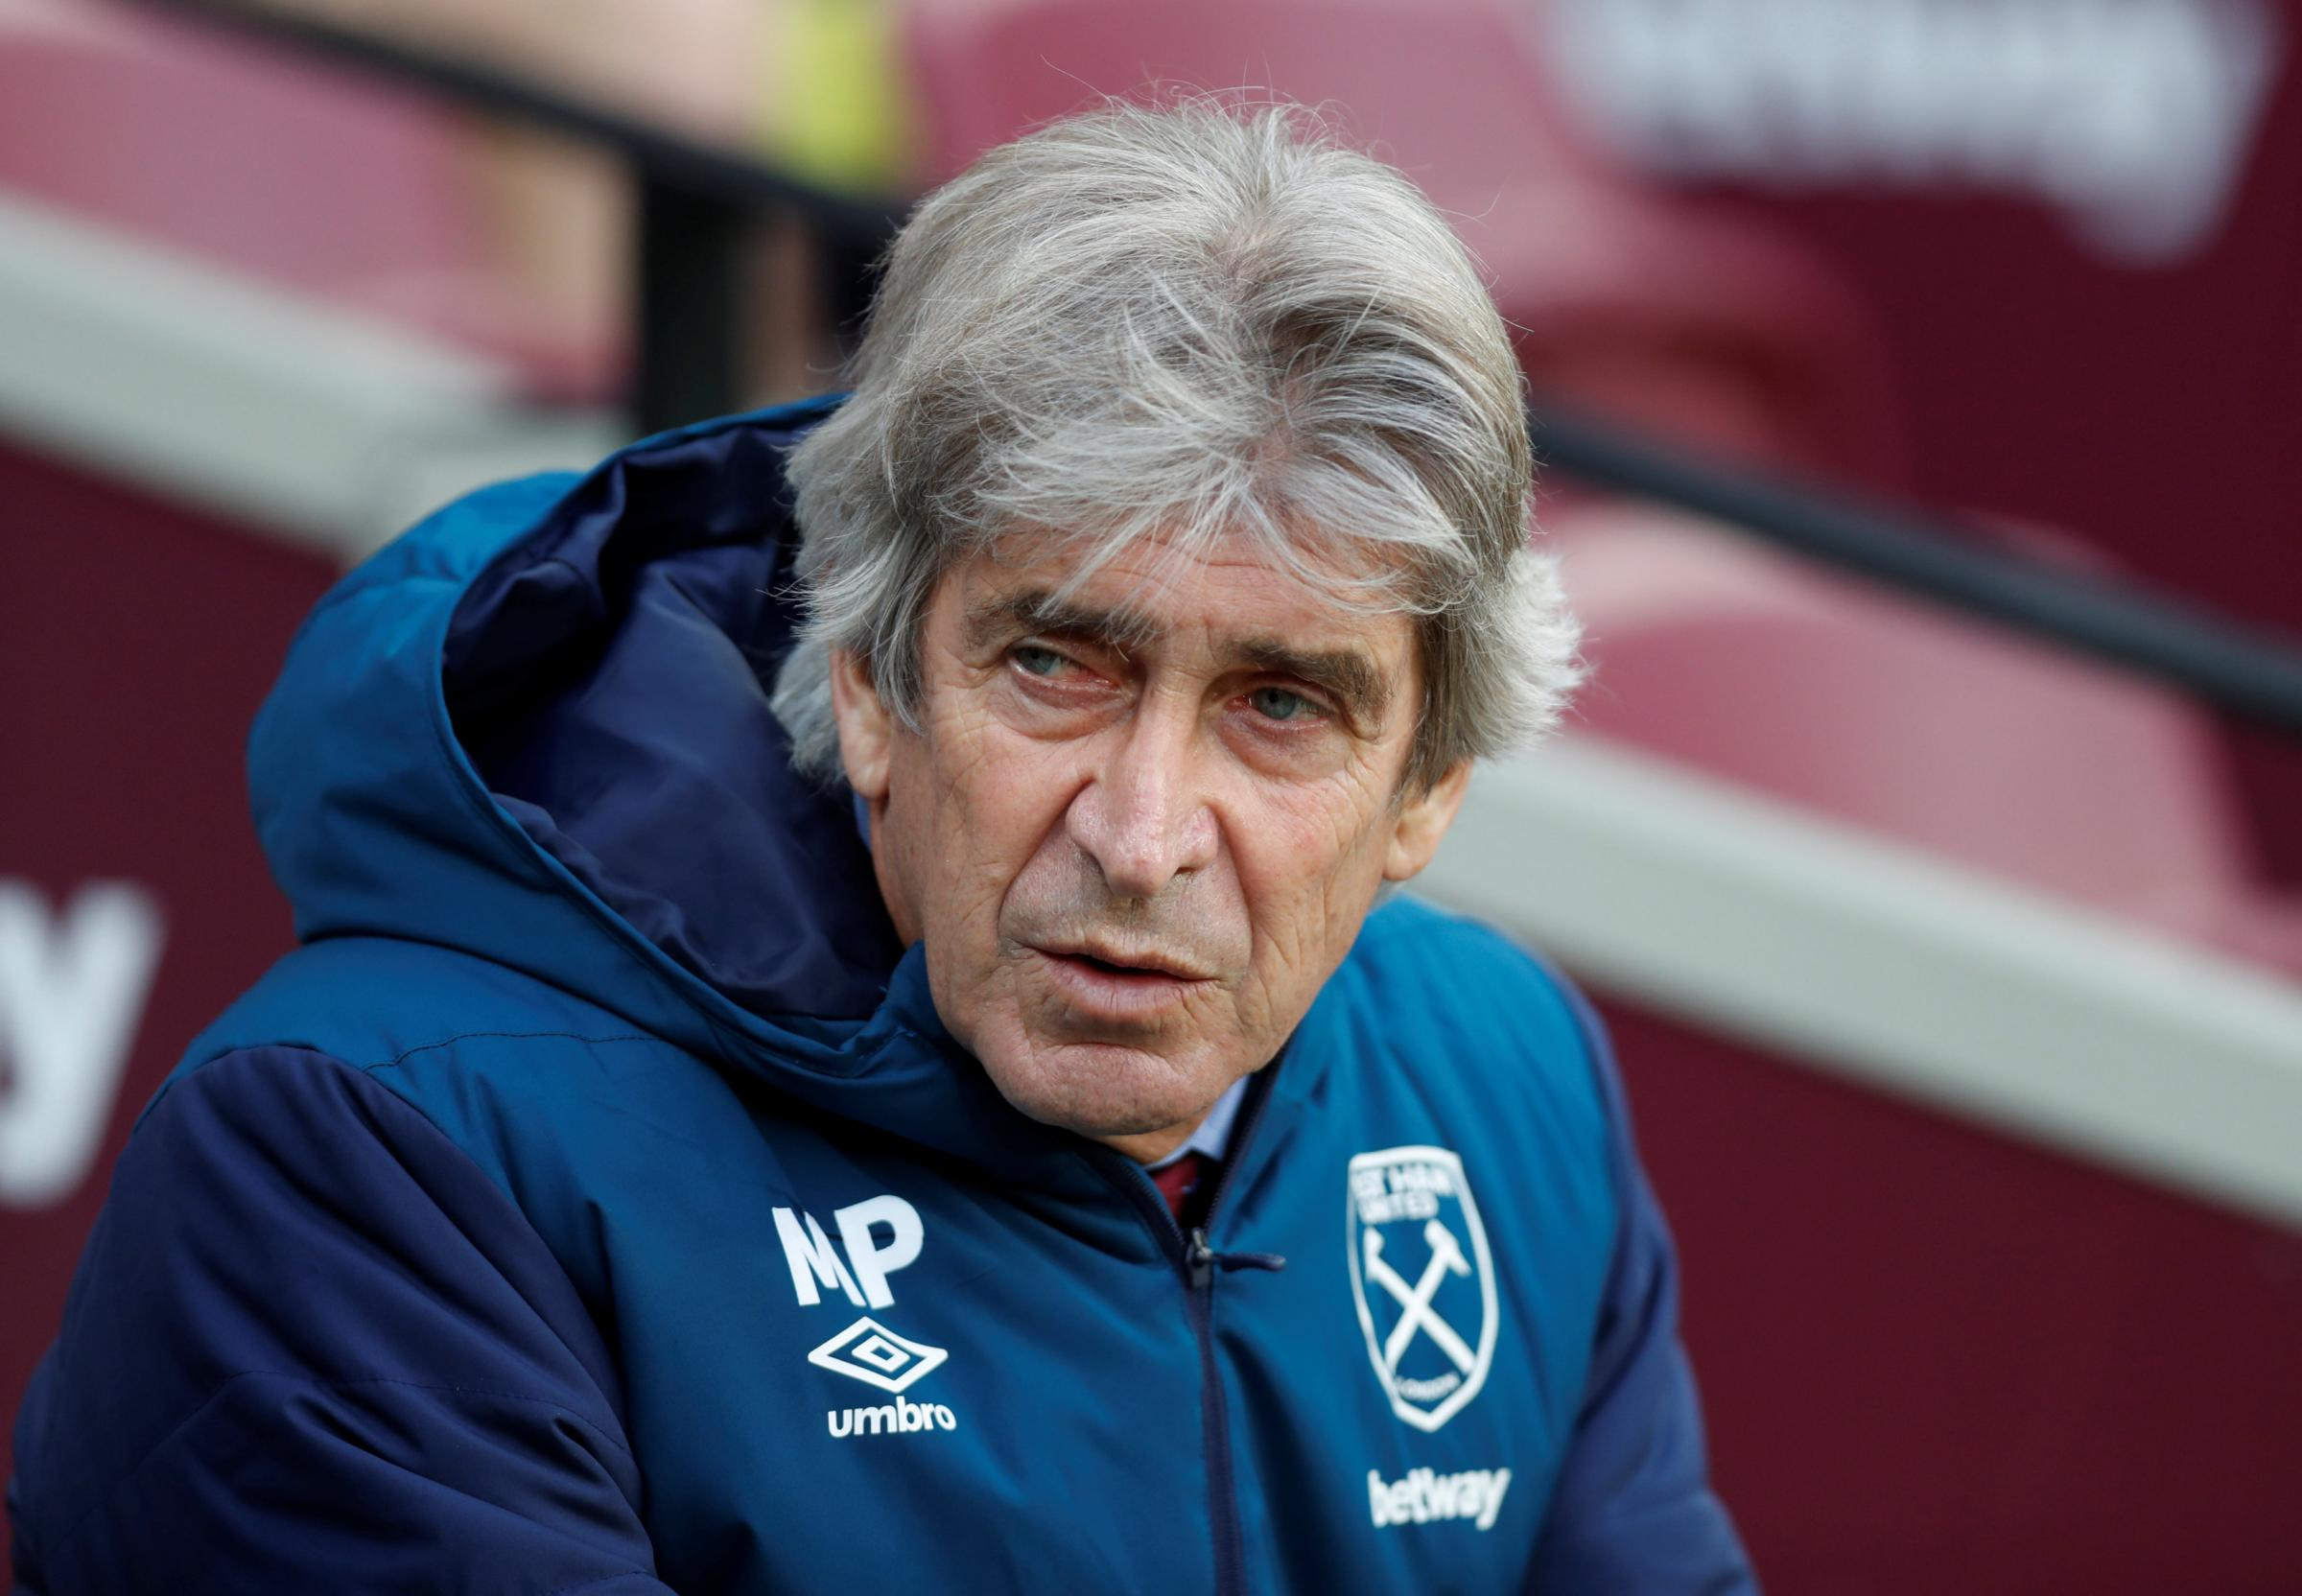 Manuel Pellegrini is looking to replicate West Ham United's performance against Watford from last season